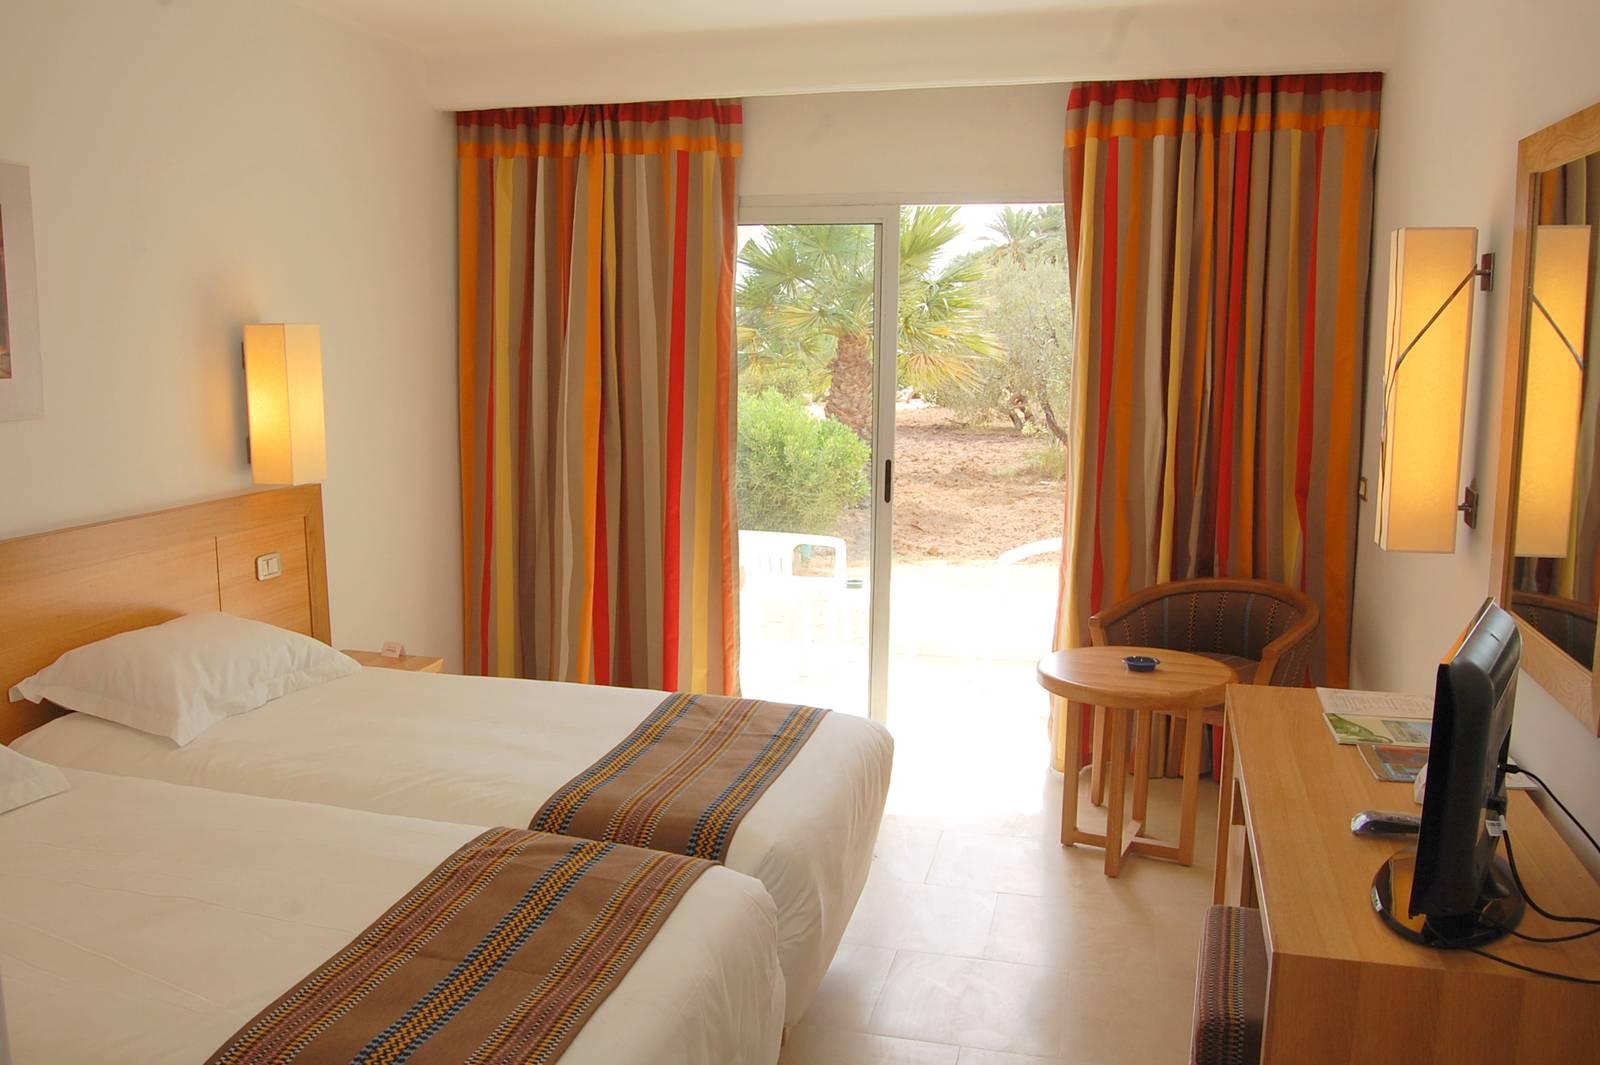 Tunisie - Djerba - Hôtel Golf Beach 3*